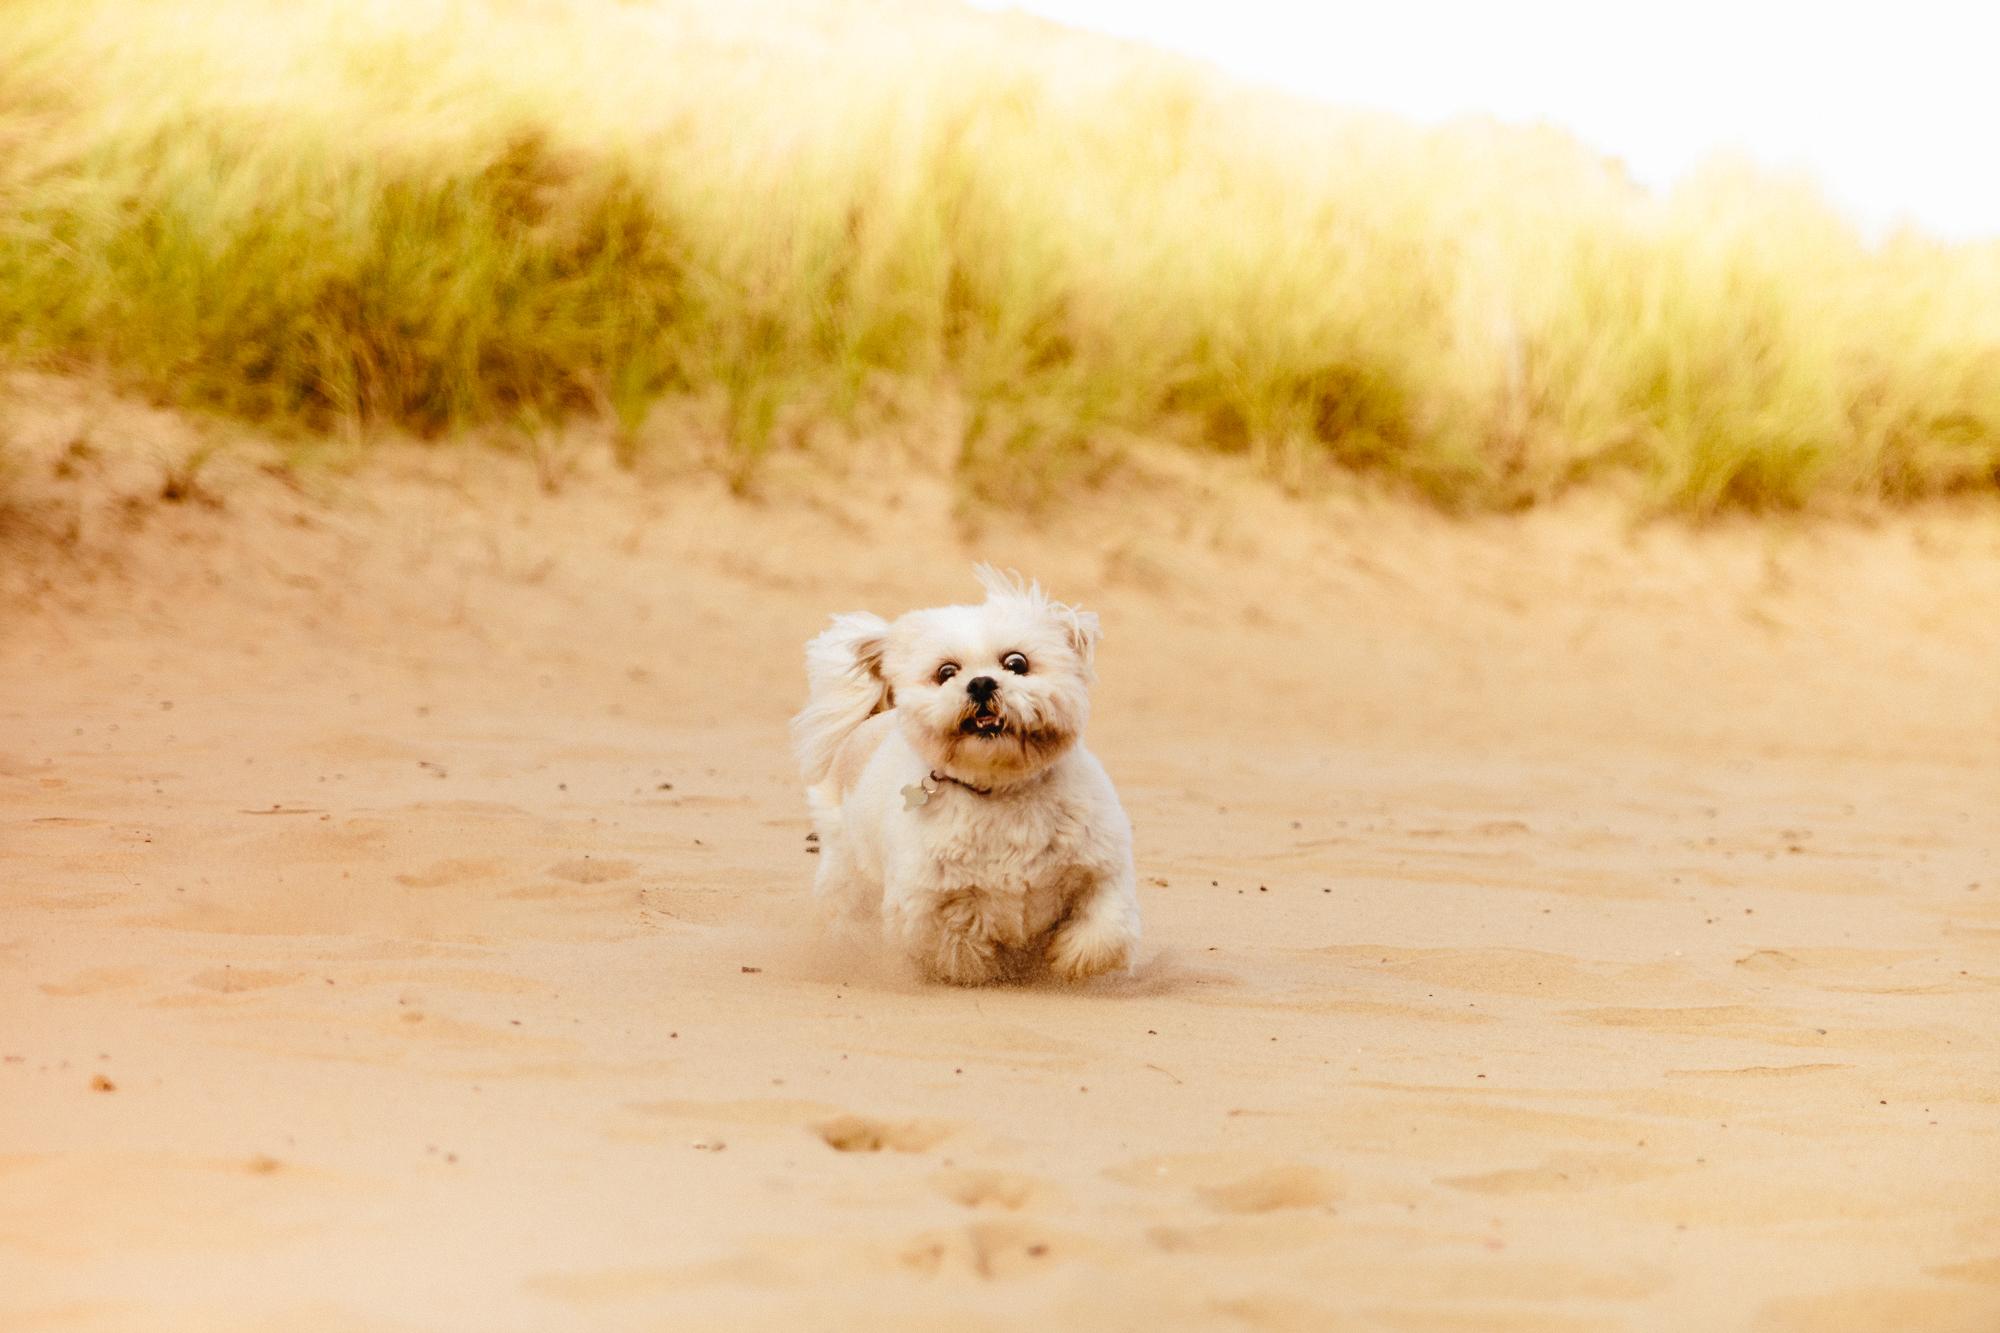 Beach-Lola-20161008-Ant Tran-3622.jpg